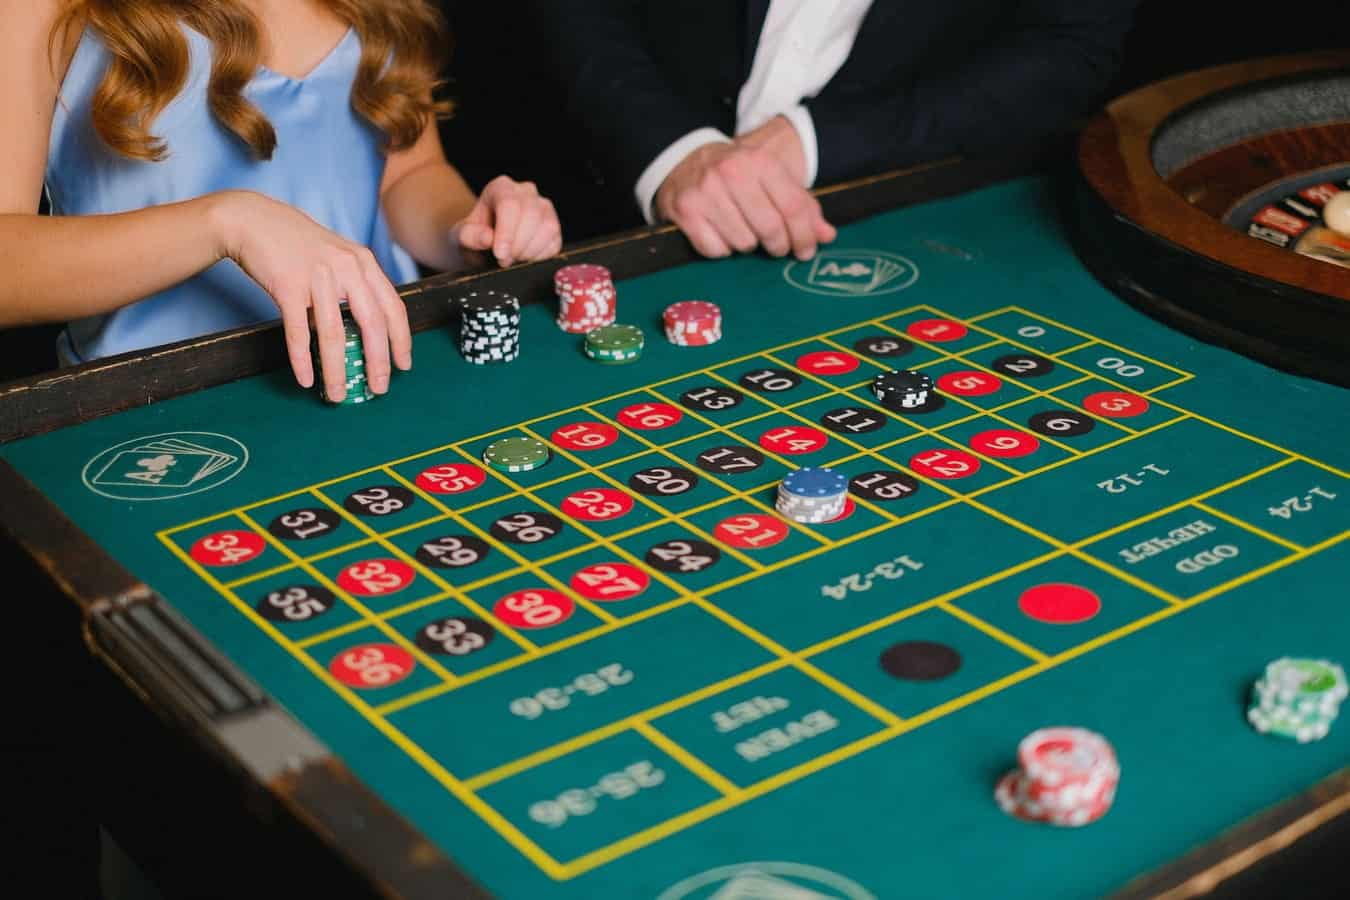 Casino game image 884843931